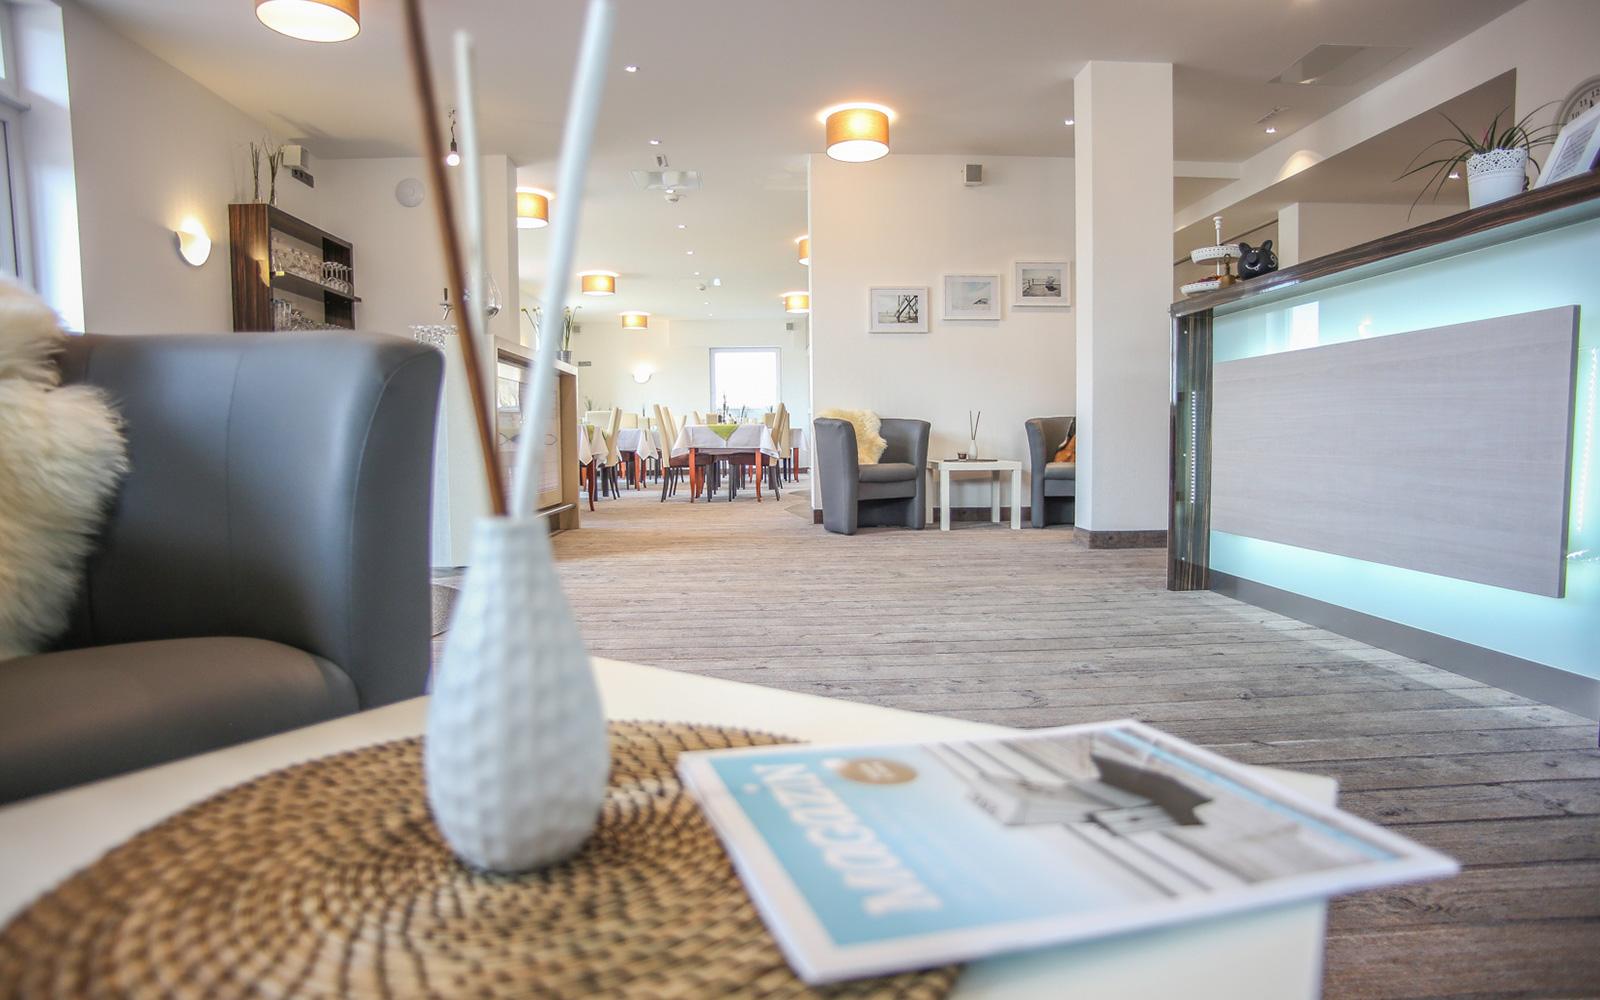 strandburg lobby1 hotel strandburg st peter ording. Black Bedroom Furniture Sets. Home Design Ideas